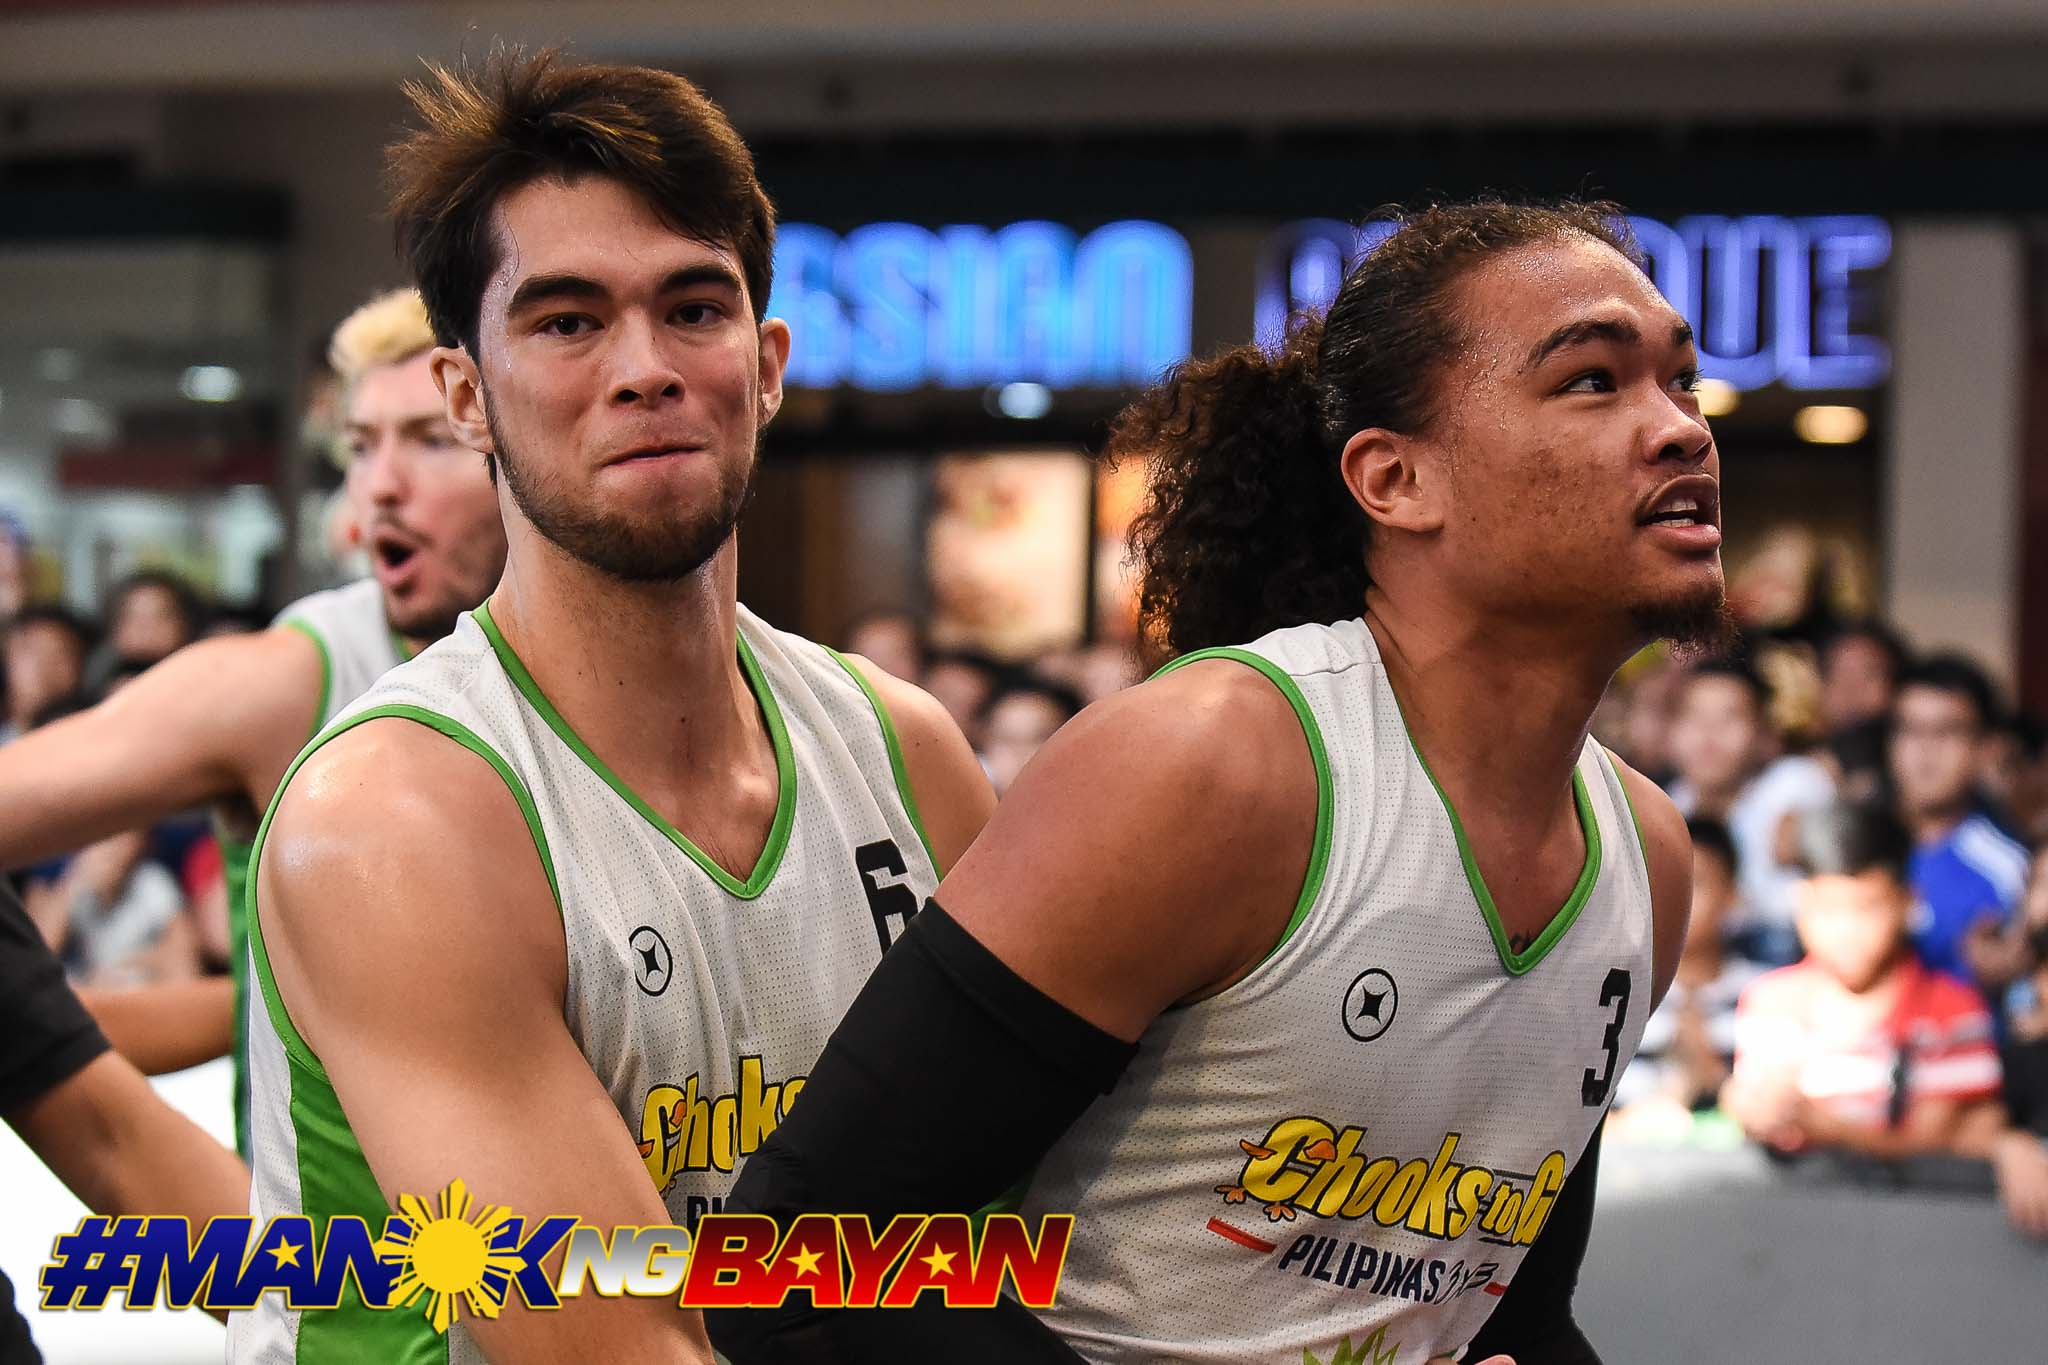 Chooks-3x3-Pasig-vs.-Bataan-Munzon-Rike-1983 Troy Rike, Franky Johnson to remain in Chooks 3x3 3x3 Basketball Chooks-to-Go Pilipinas 3x3 News PBA  - philippine sports news